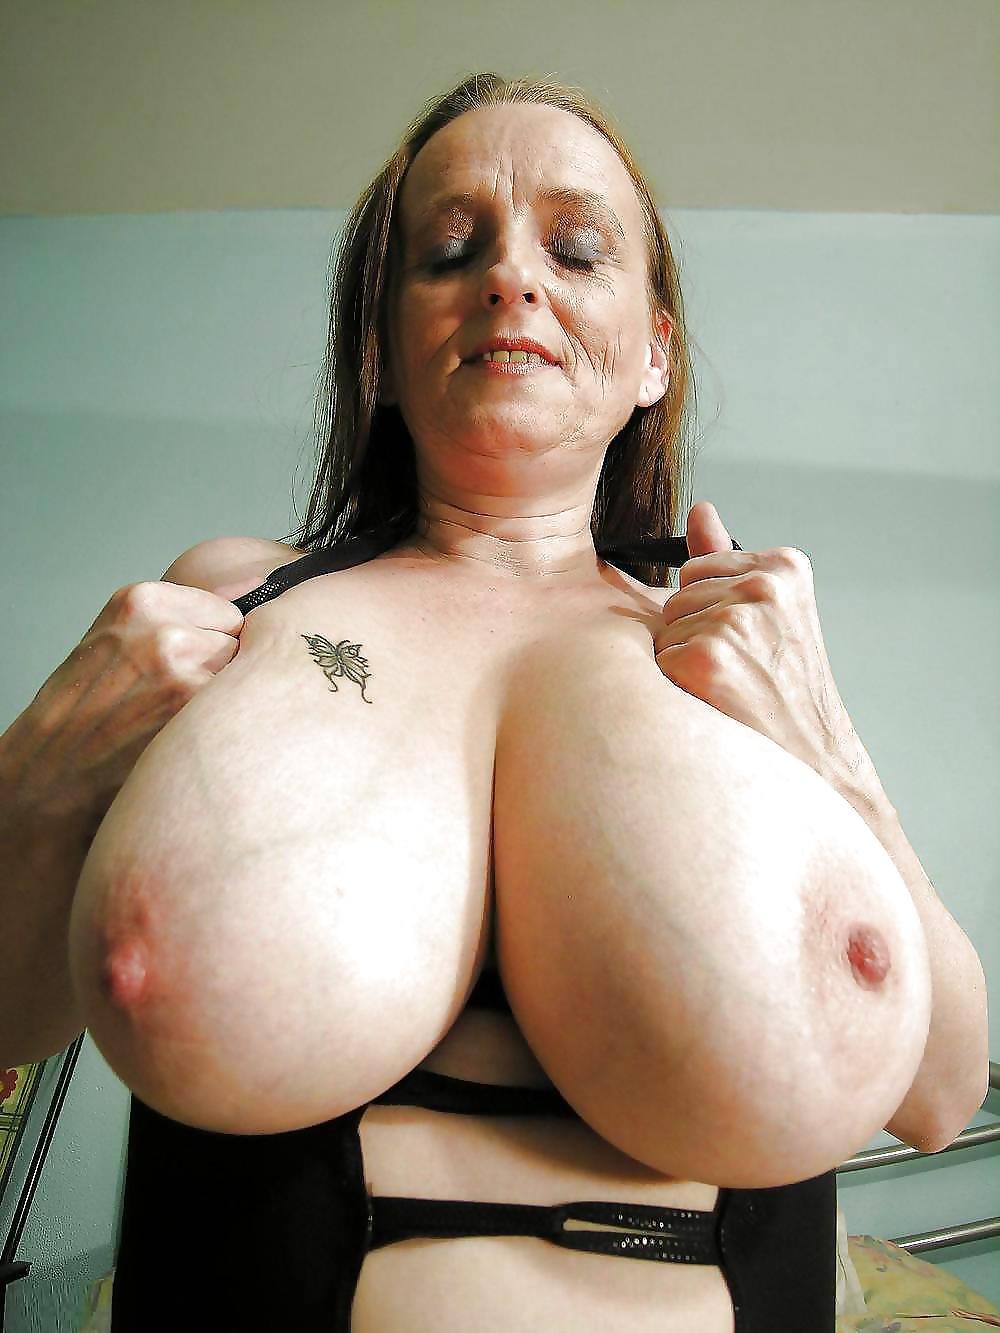 Cum On Mature Tits Pics